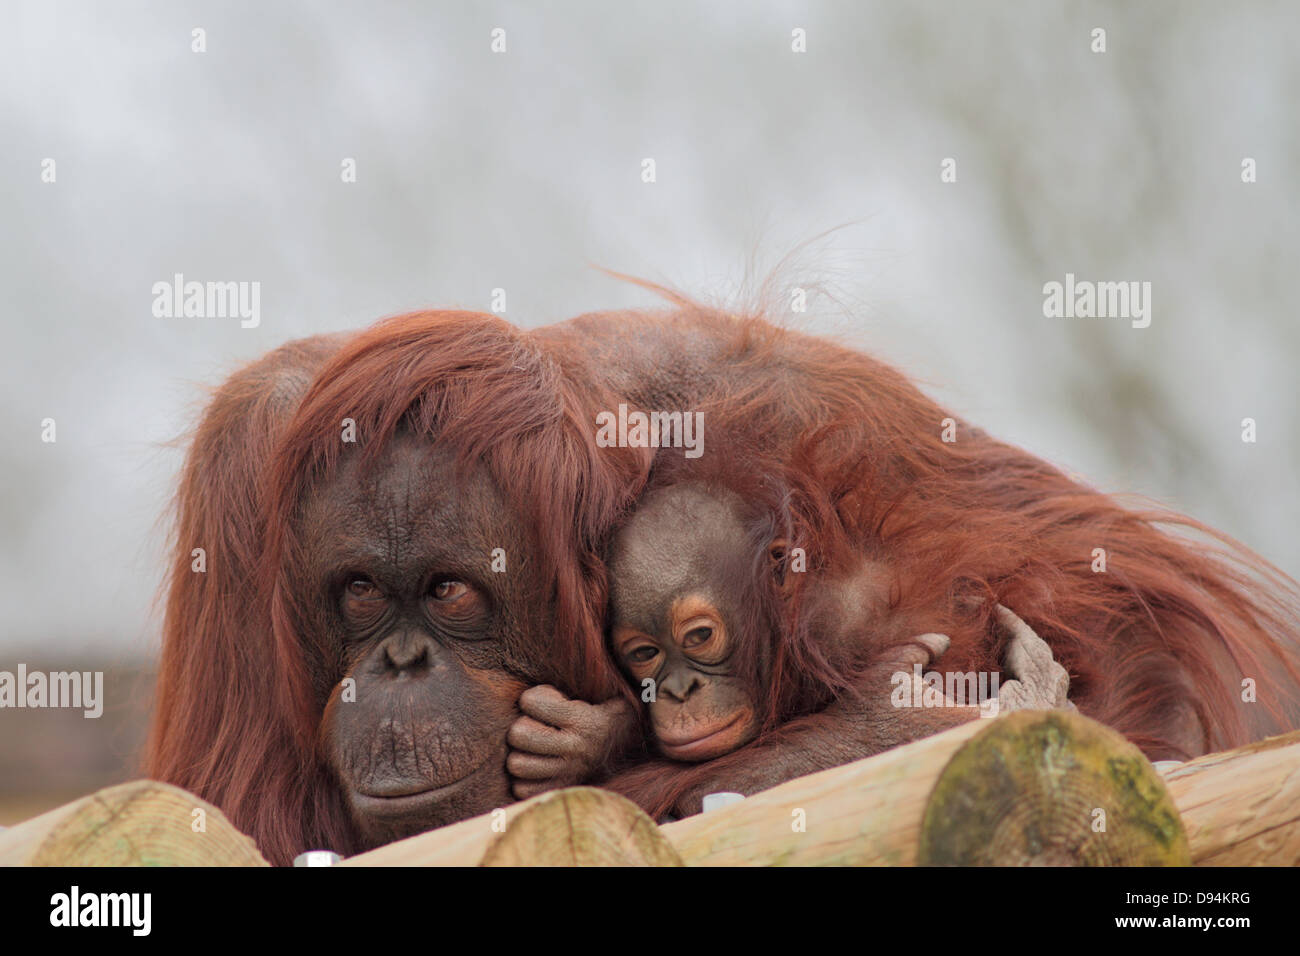 Bornean Orang utan Pongo pygmaeus pygmaeus  mother and young in zoo. - Stock Image